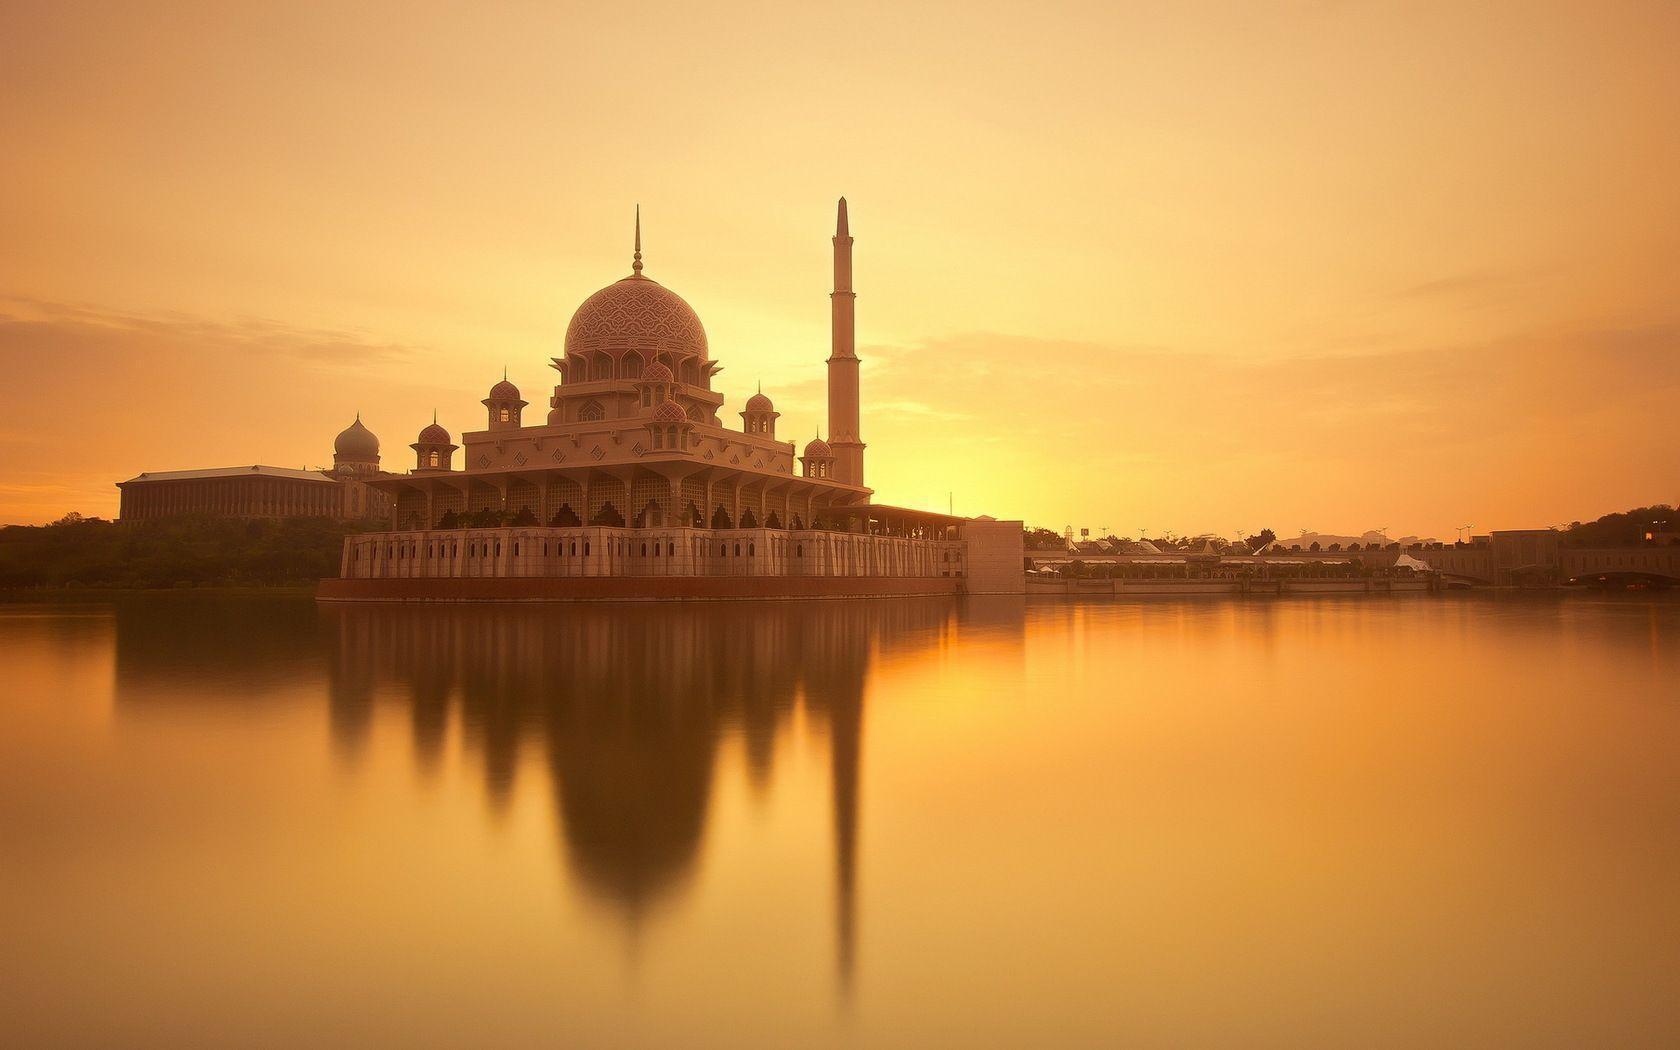 6 Qolsharif Mosque HD Wallpapers | Backgrounds - Wallpaper Abyss